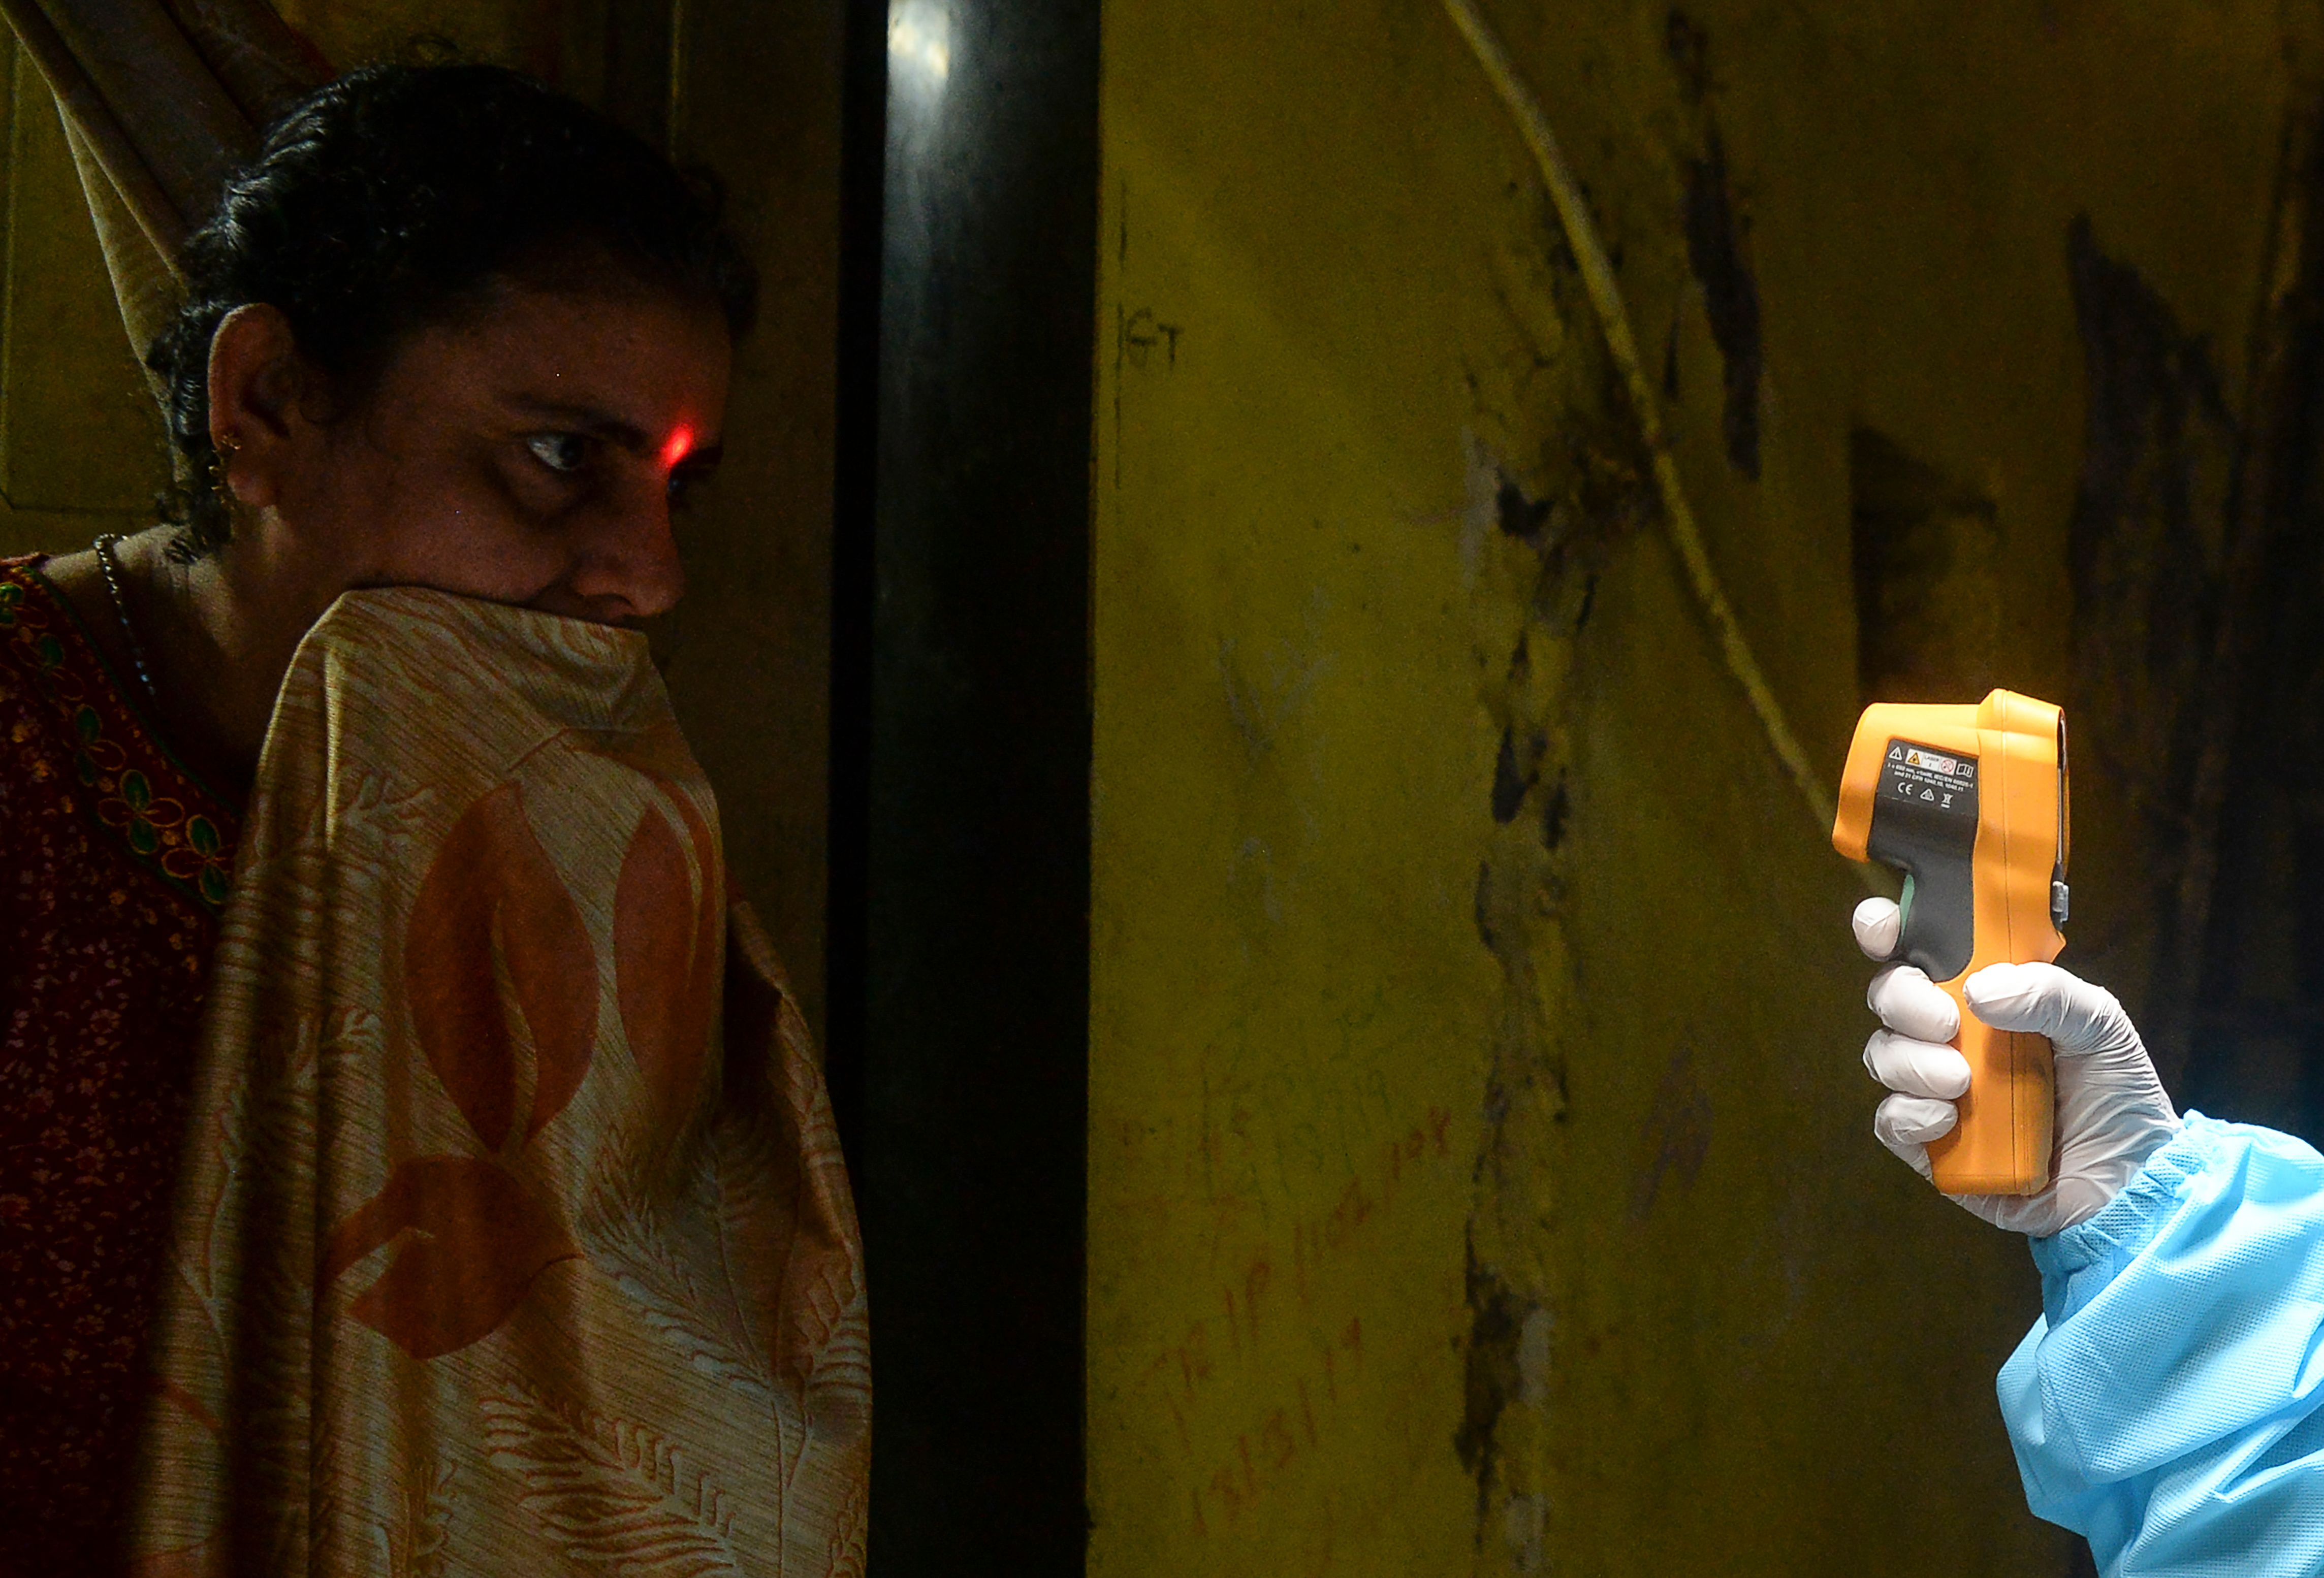 dharavi social distancing coronavirus mumbai asia largest slum